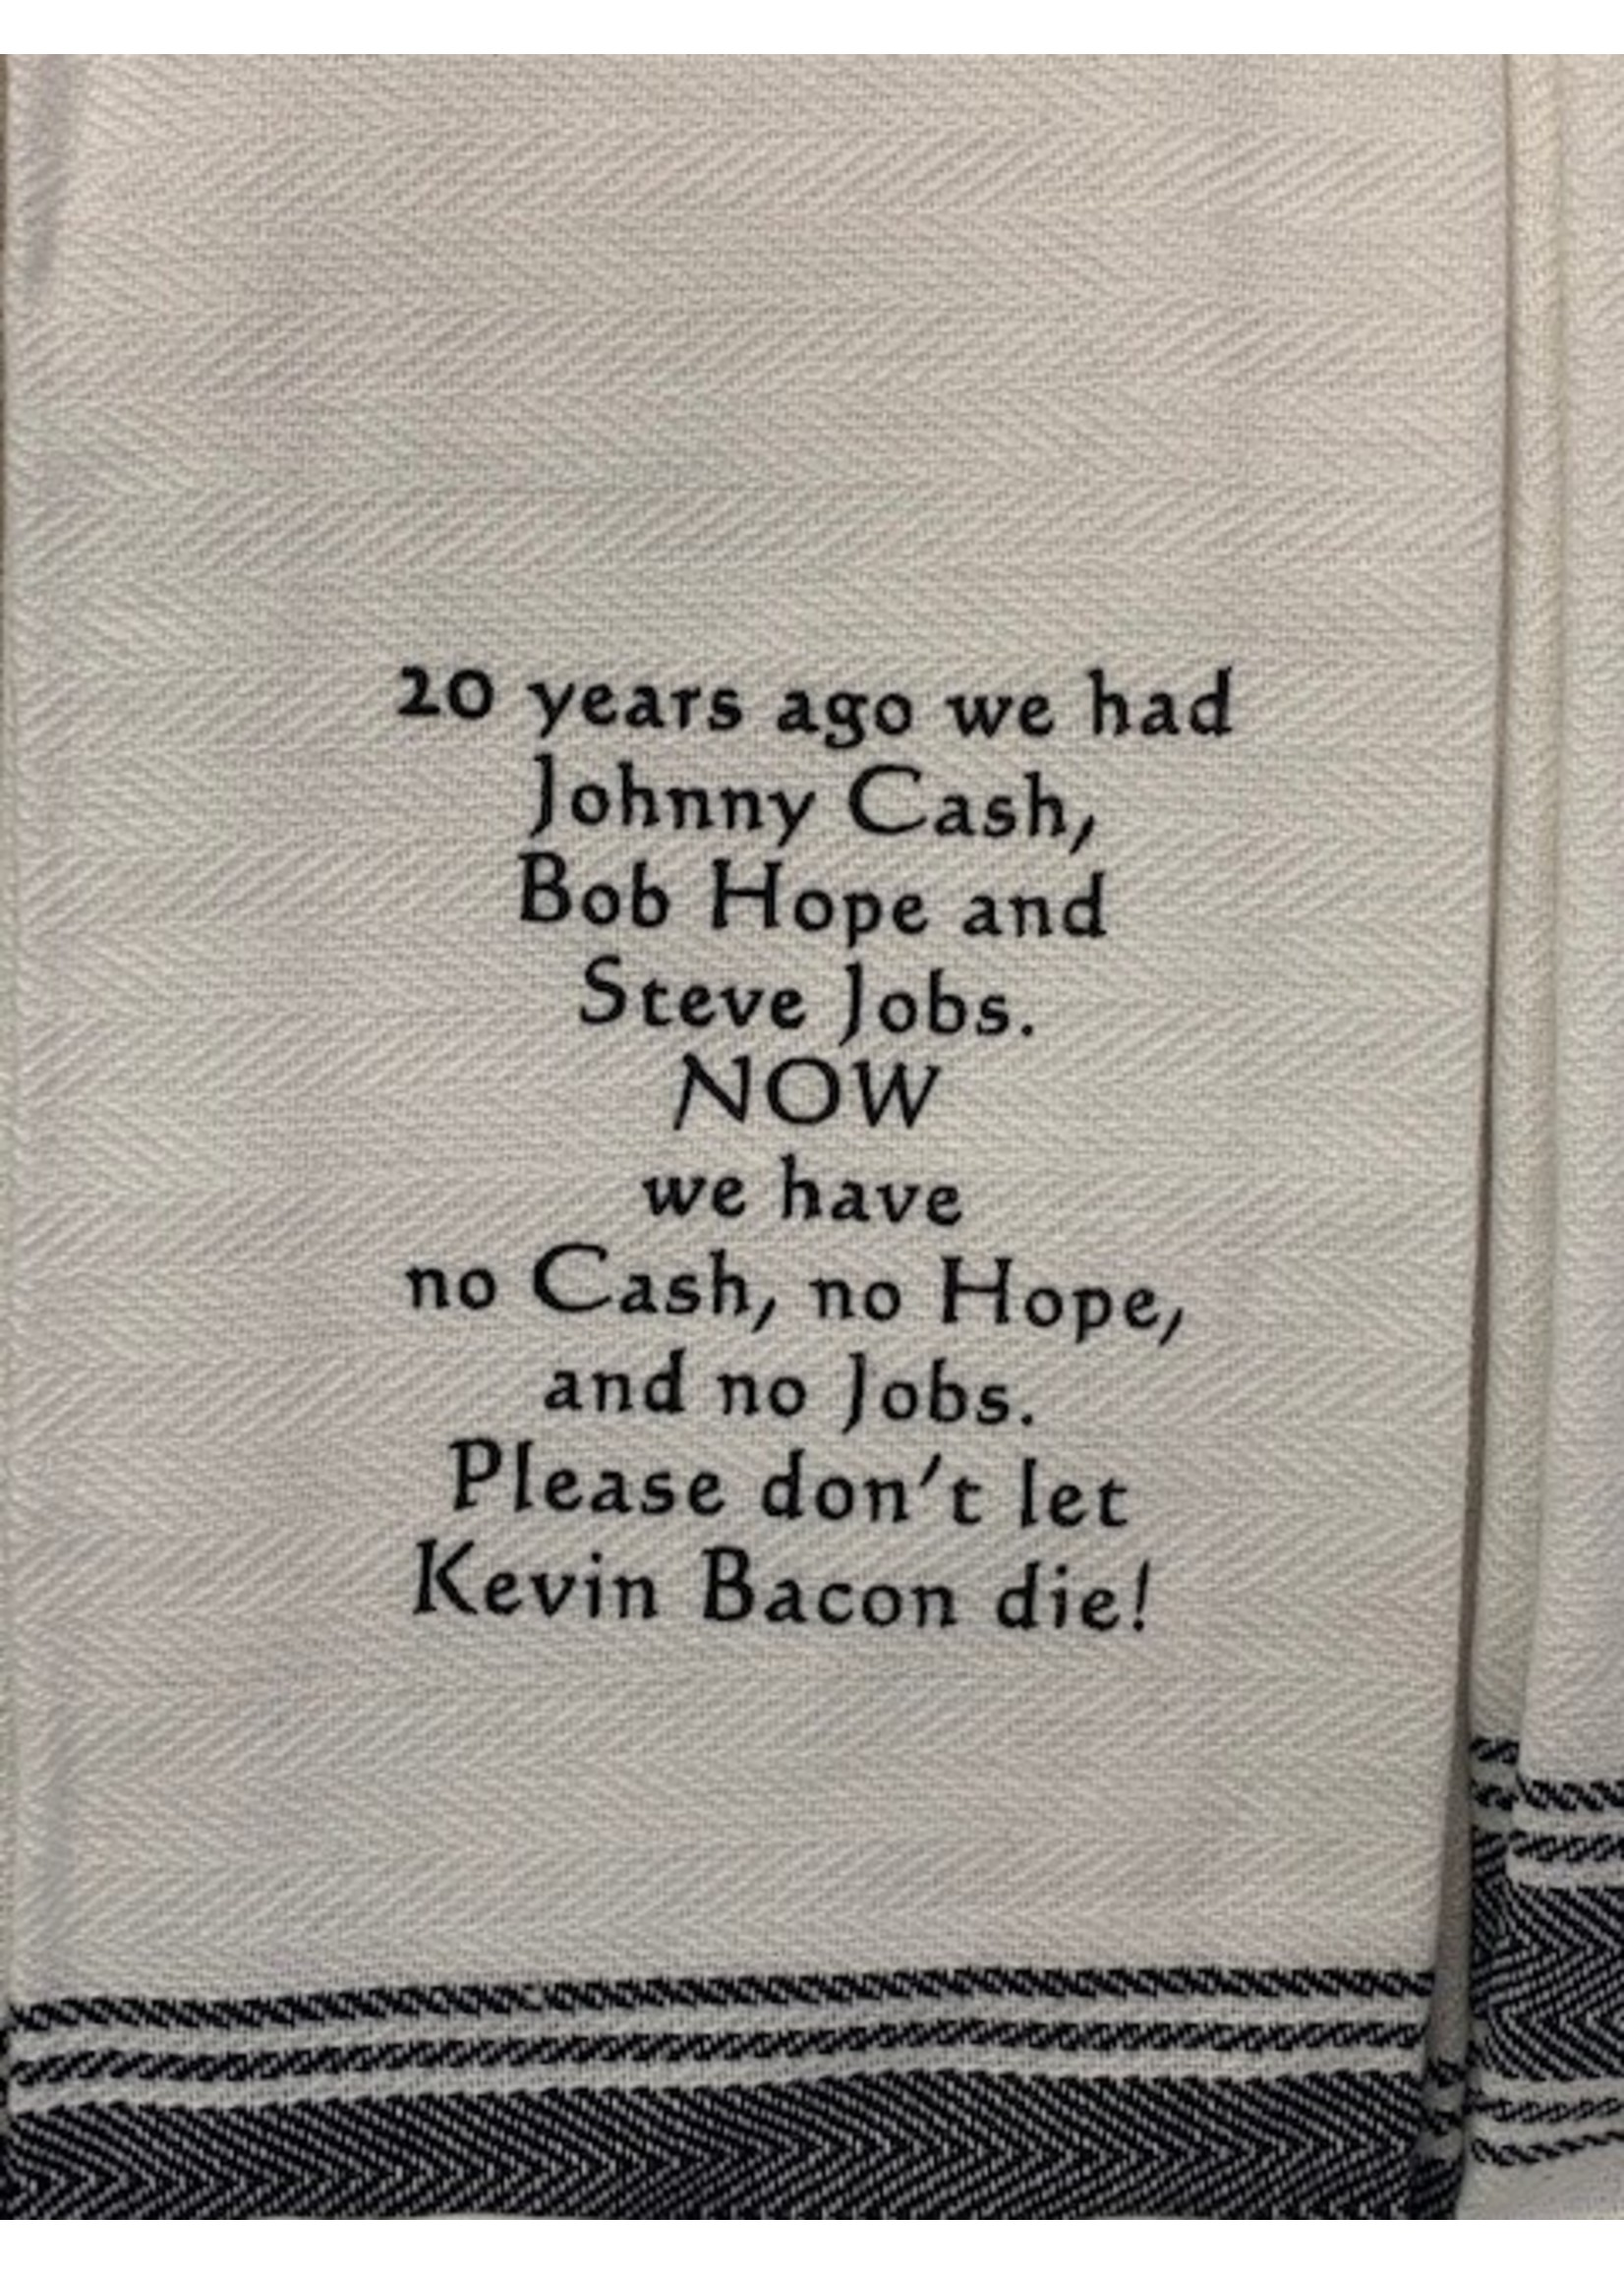 Wild Hare Designs 20 Years Ago We Had... Towel